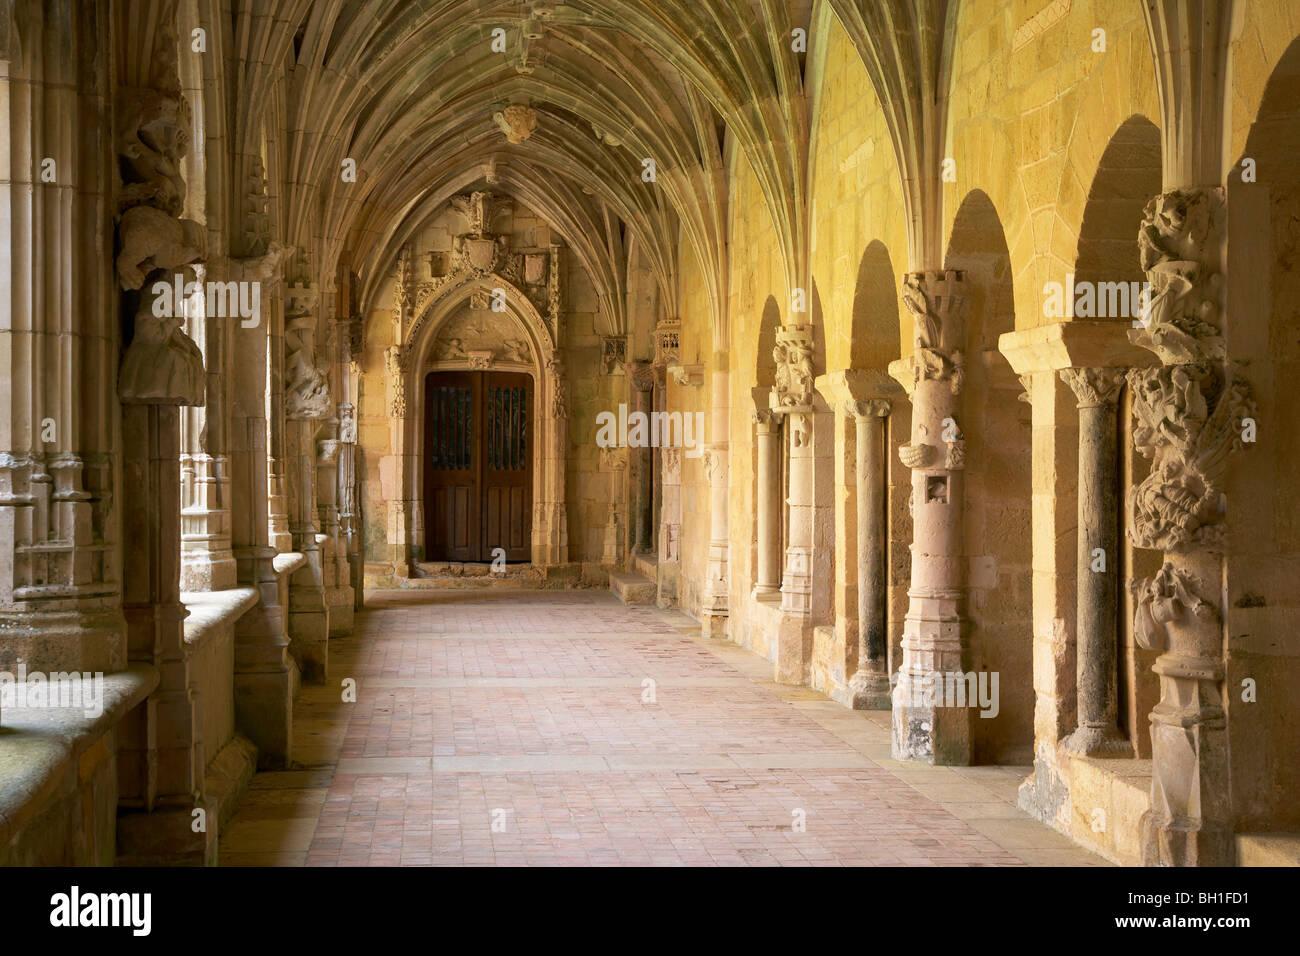 Cloister and Vault in Abbaye de Cadouin, The Way of St. James, Roads to Santiago, Chemins de Saint-Jacques, Via - Stock Image